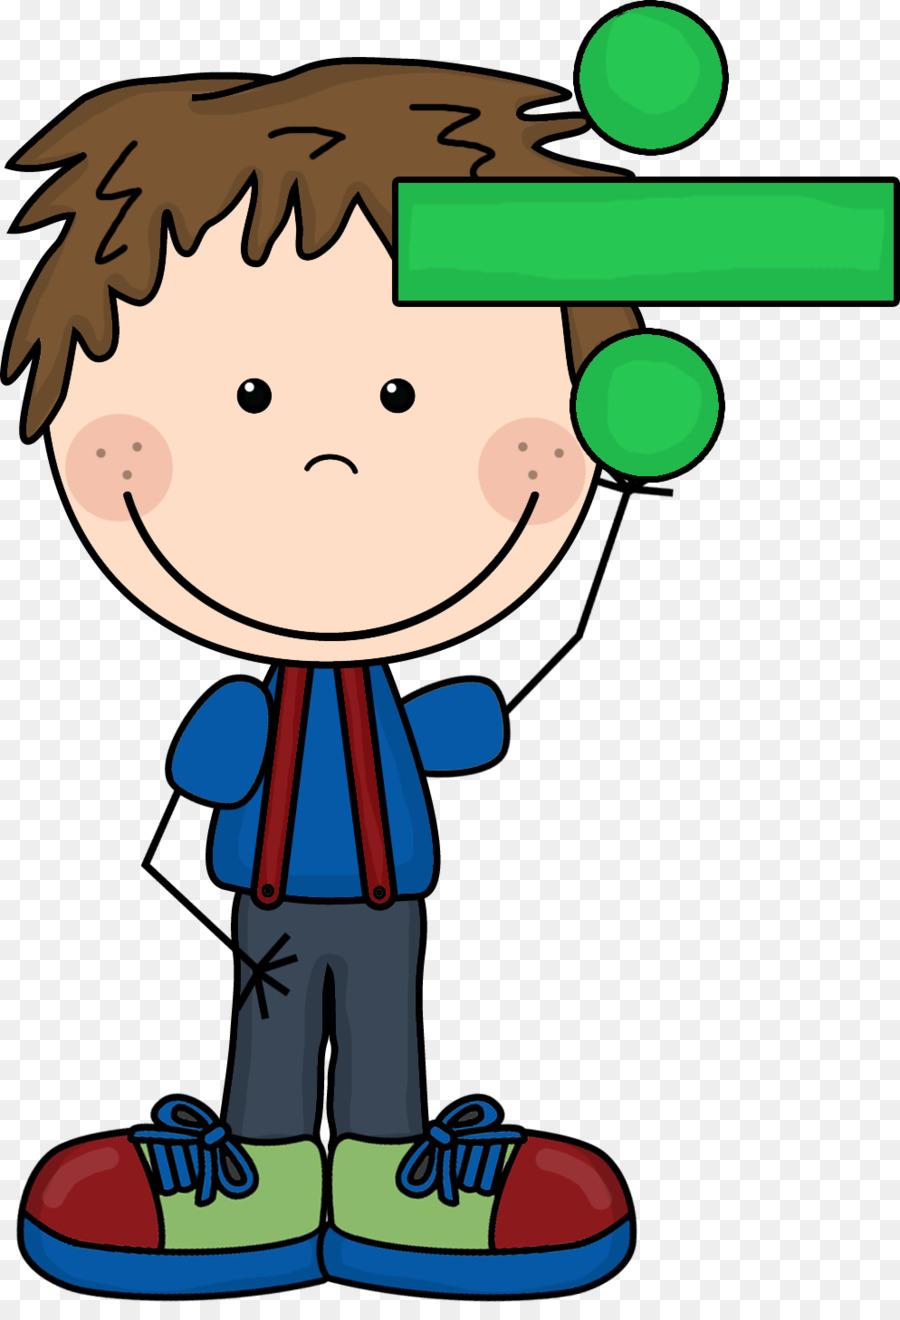 Child cartoon hand transparent. Addition clipart boy